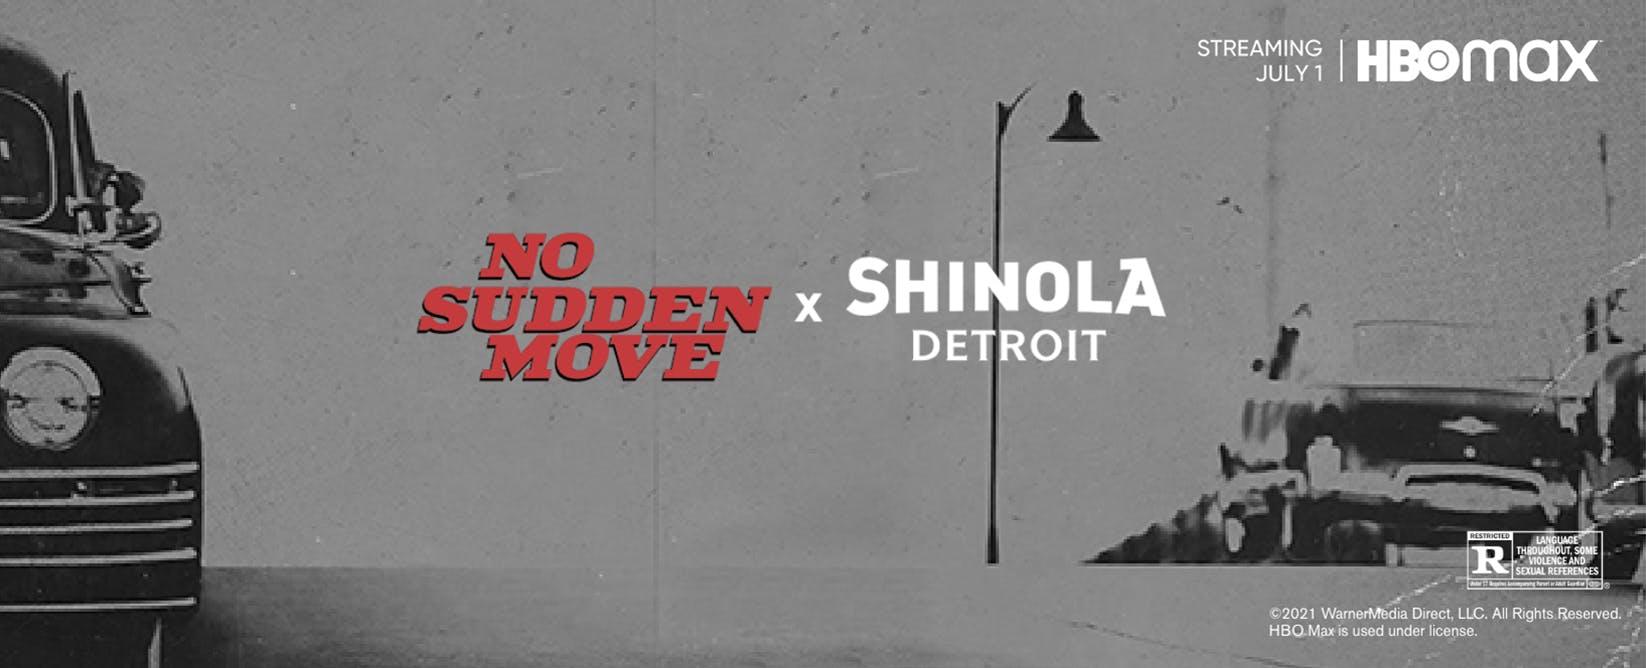 No Sudden Move x Shinola Detroit